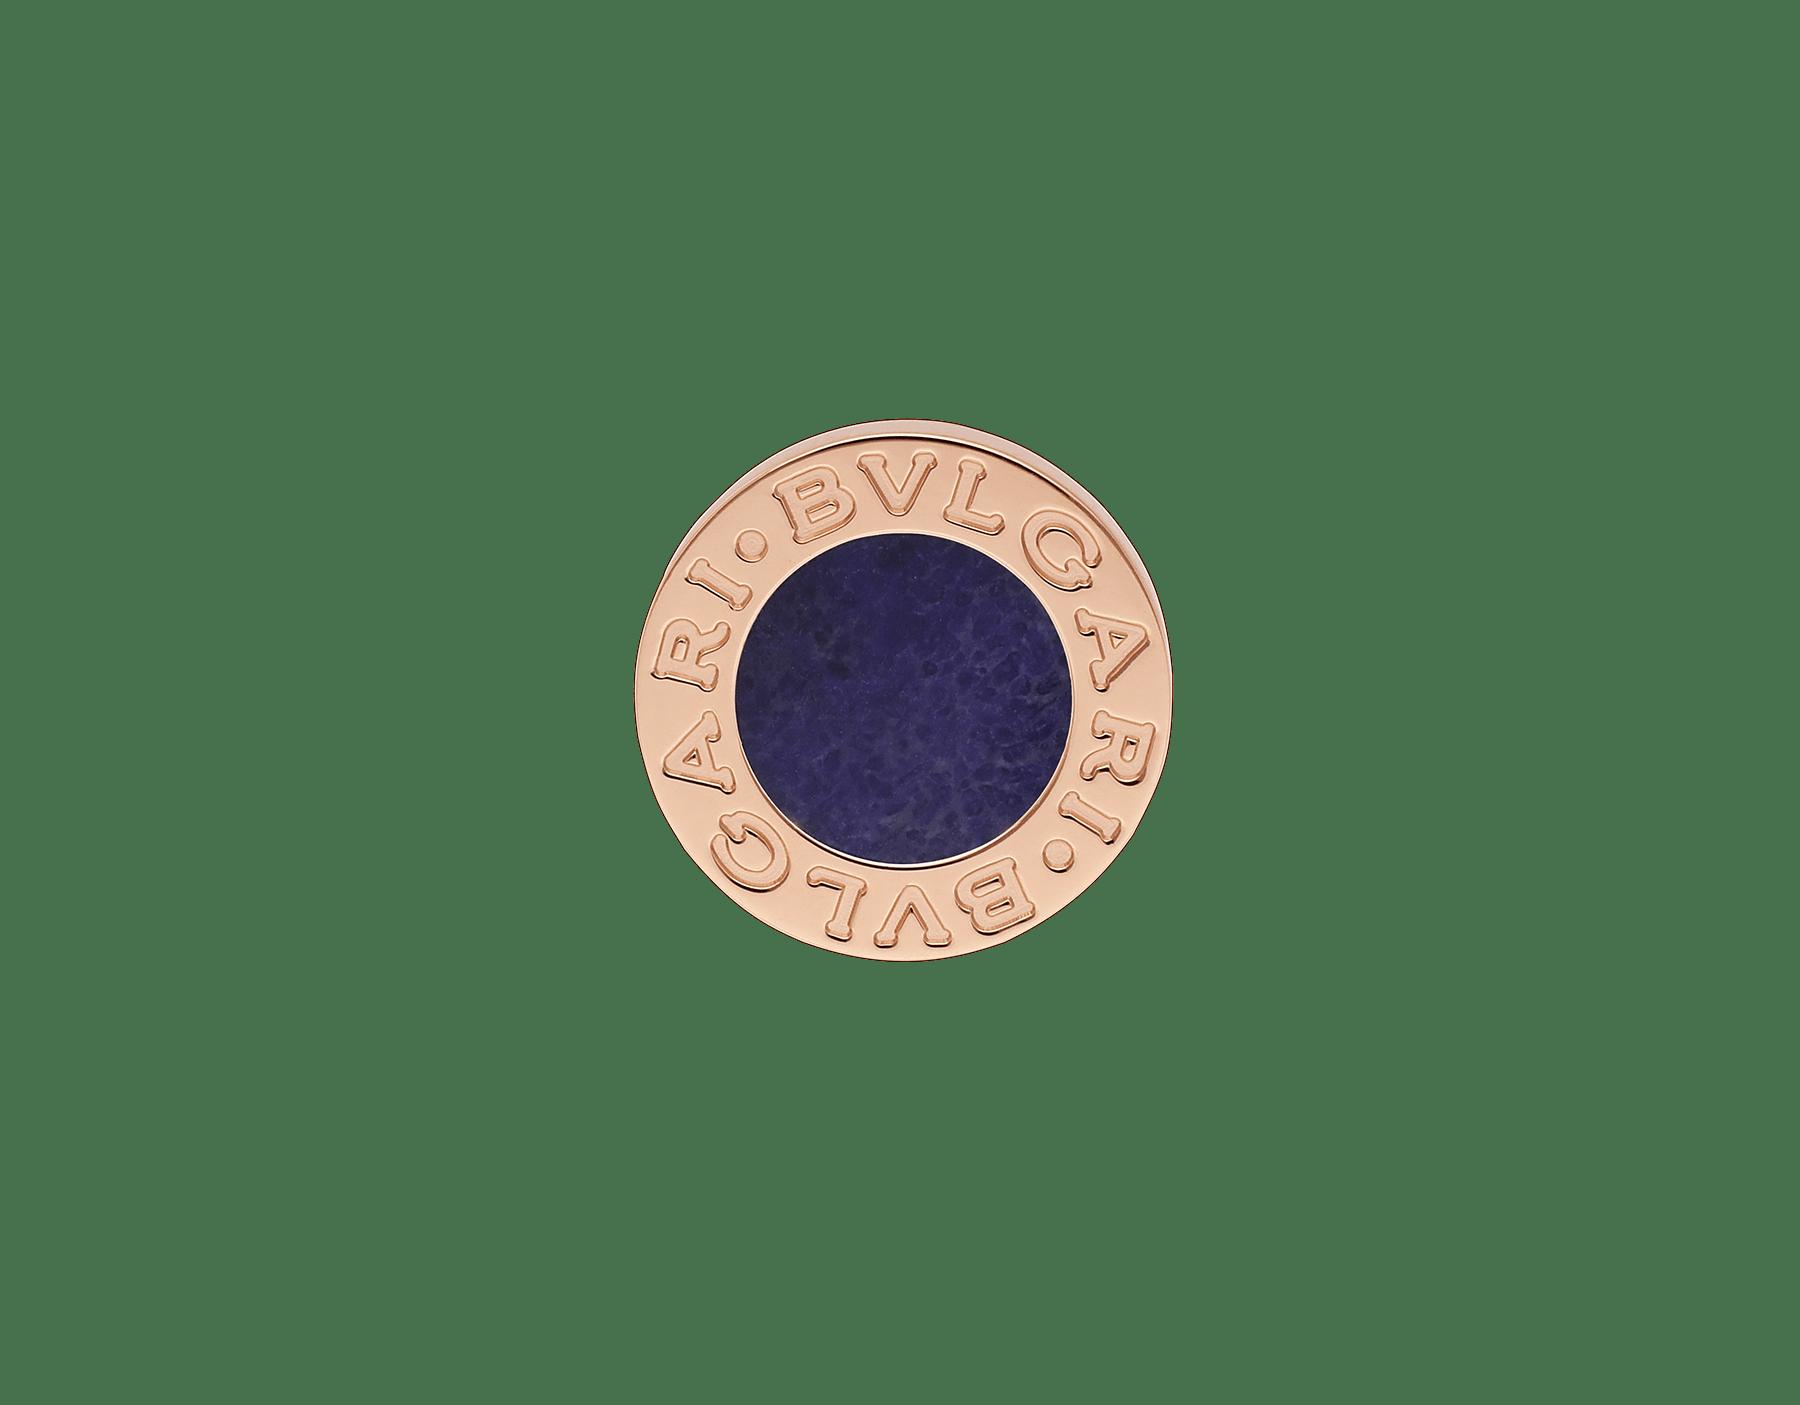 BVLGARI BVLGARI 18 kt rose gold single earring set with sugilite element 356428 image 1